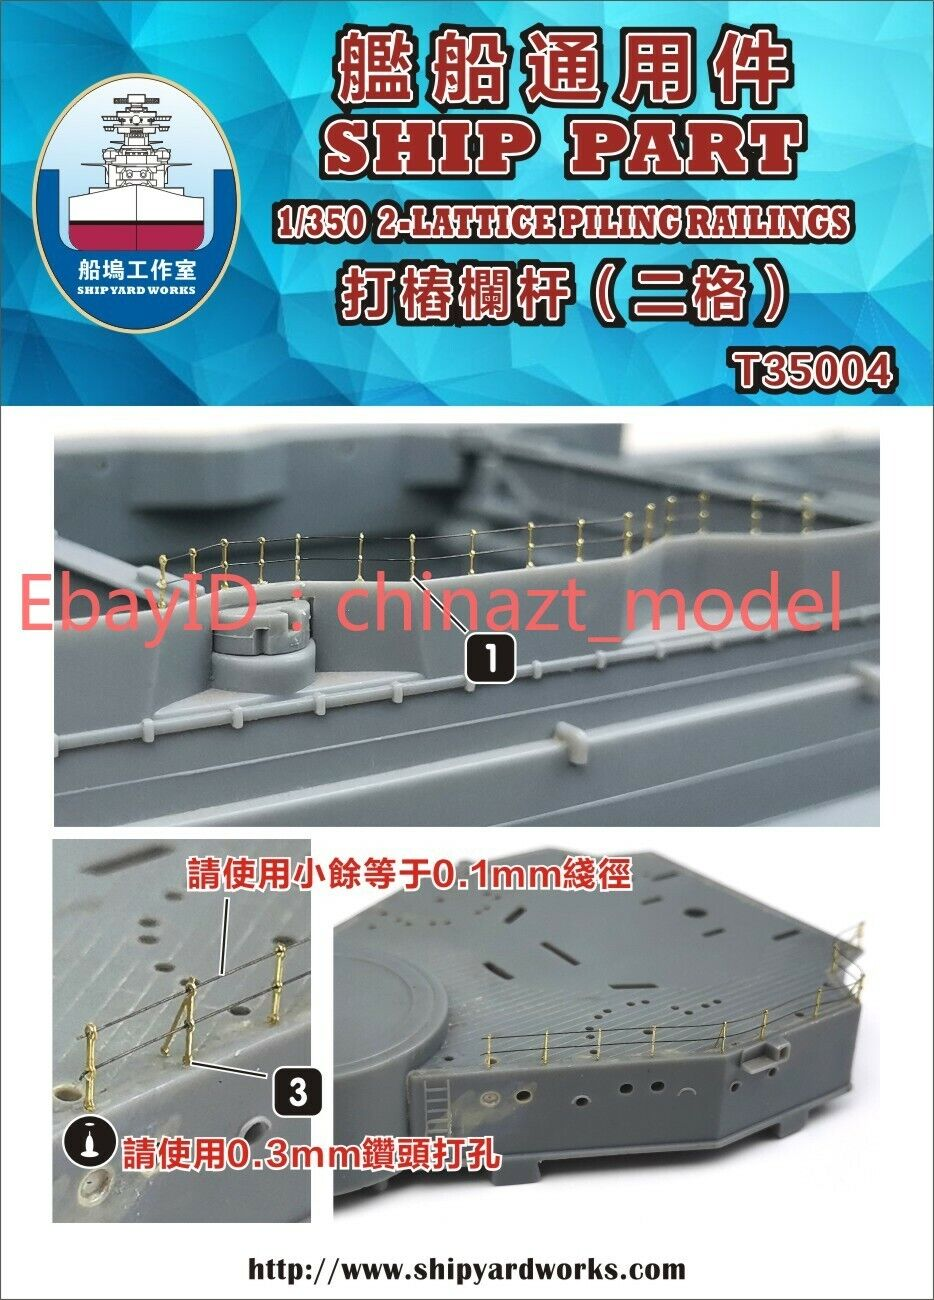 Shipyardworks 1/350 2-Lattice Piling Railings T35004